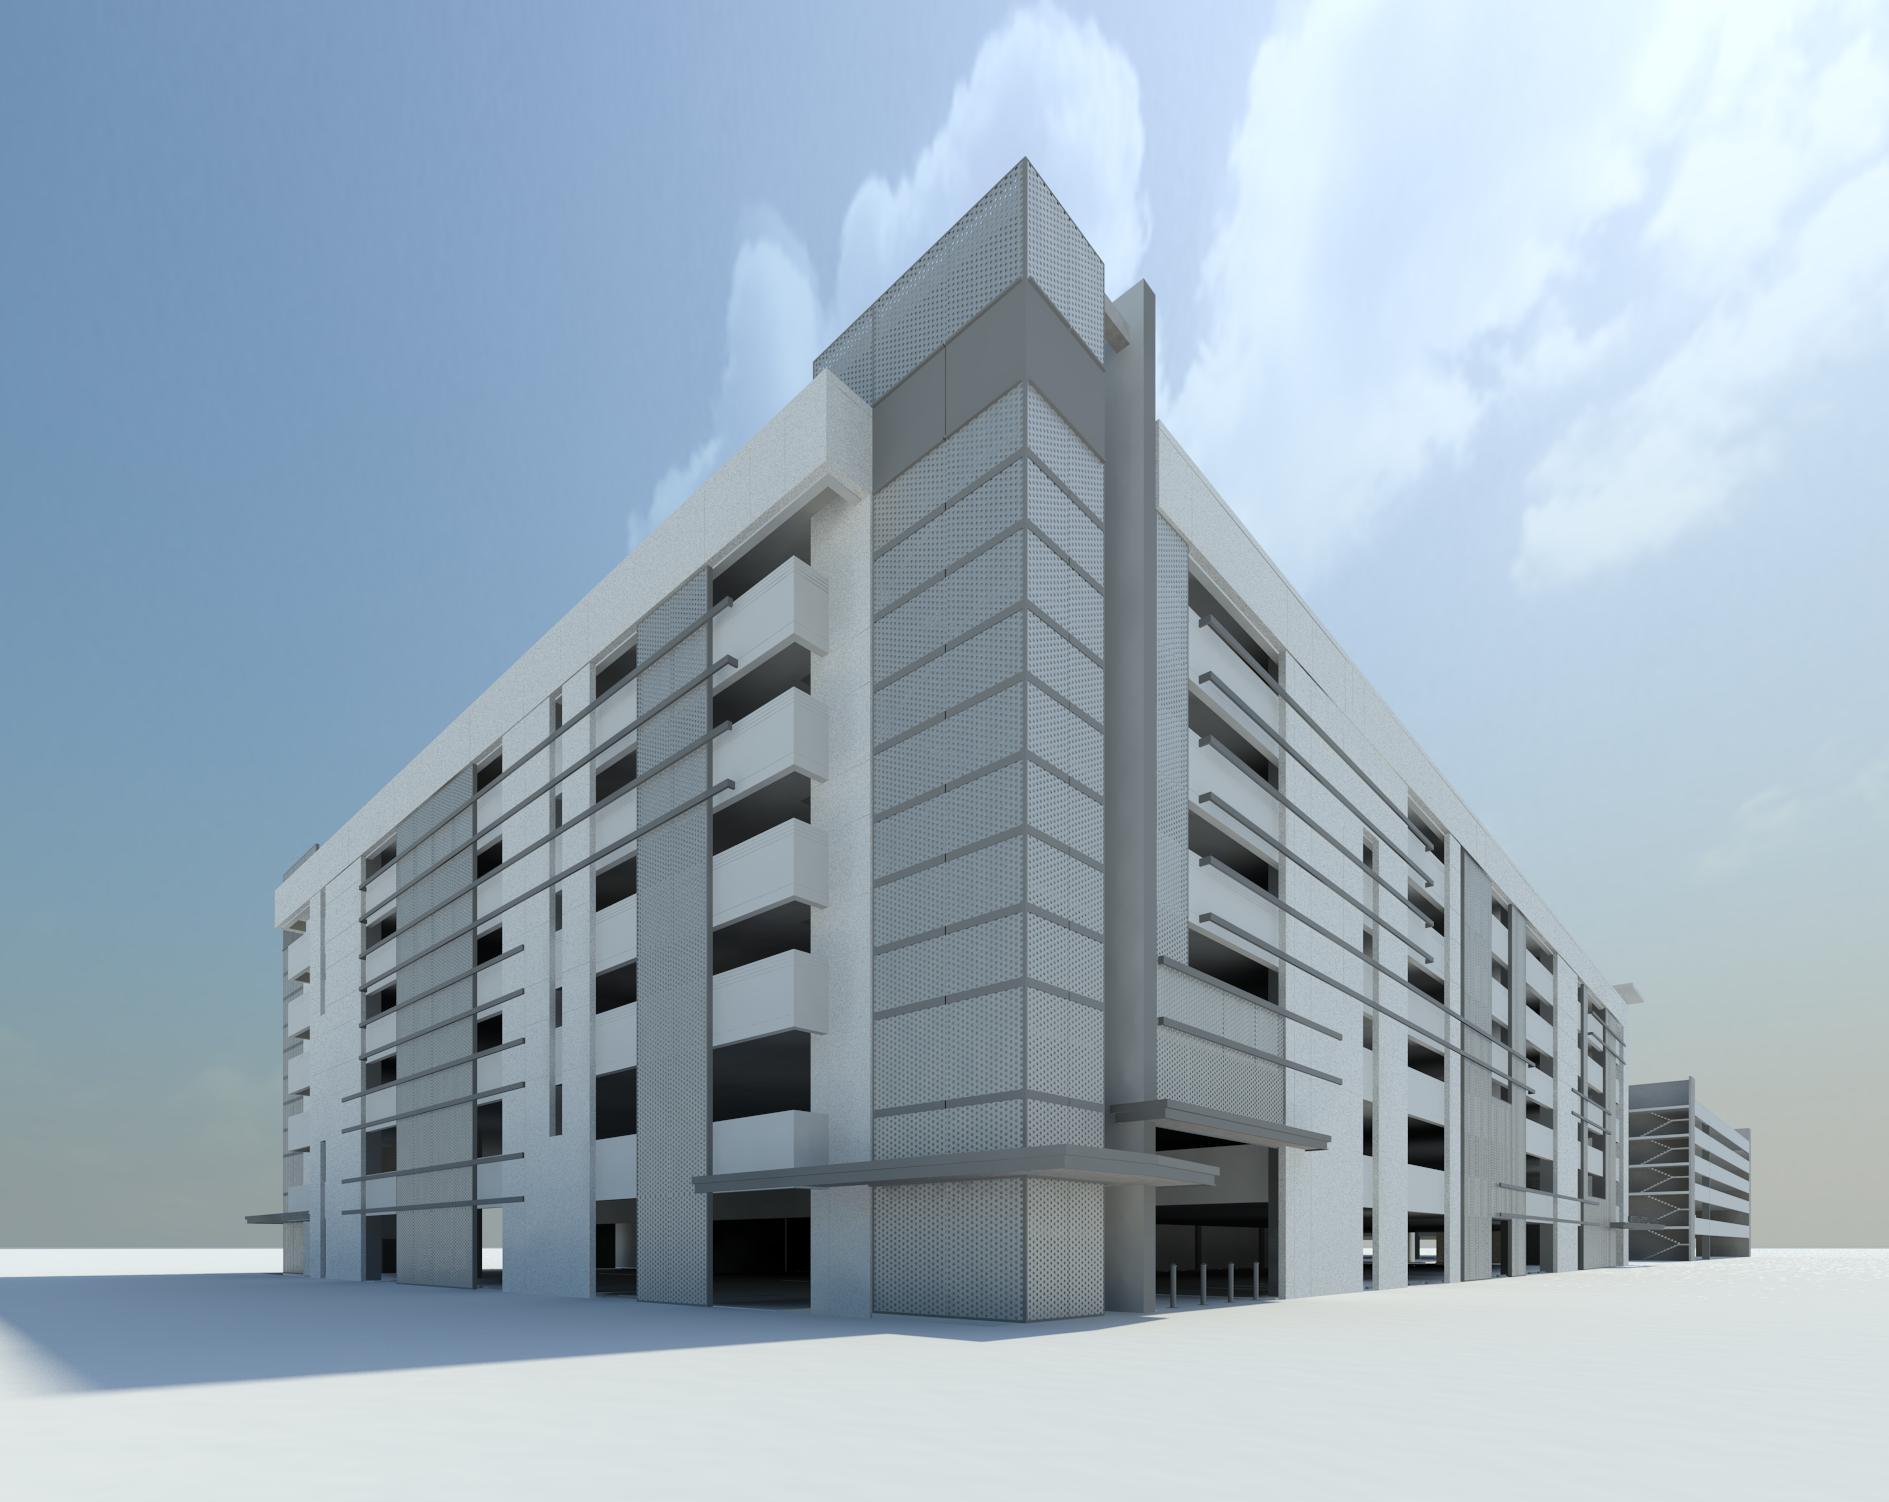 Memorial West Parking Garage